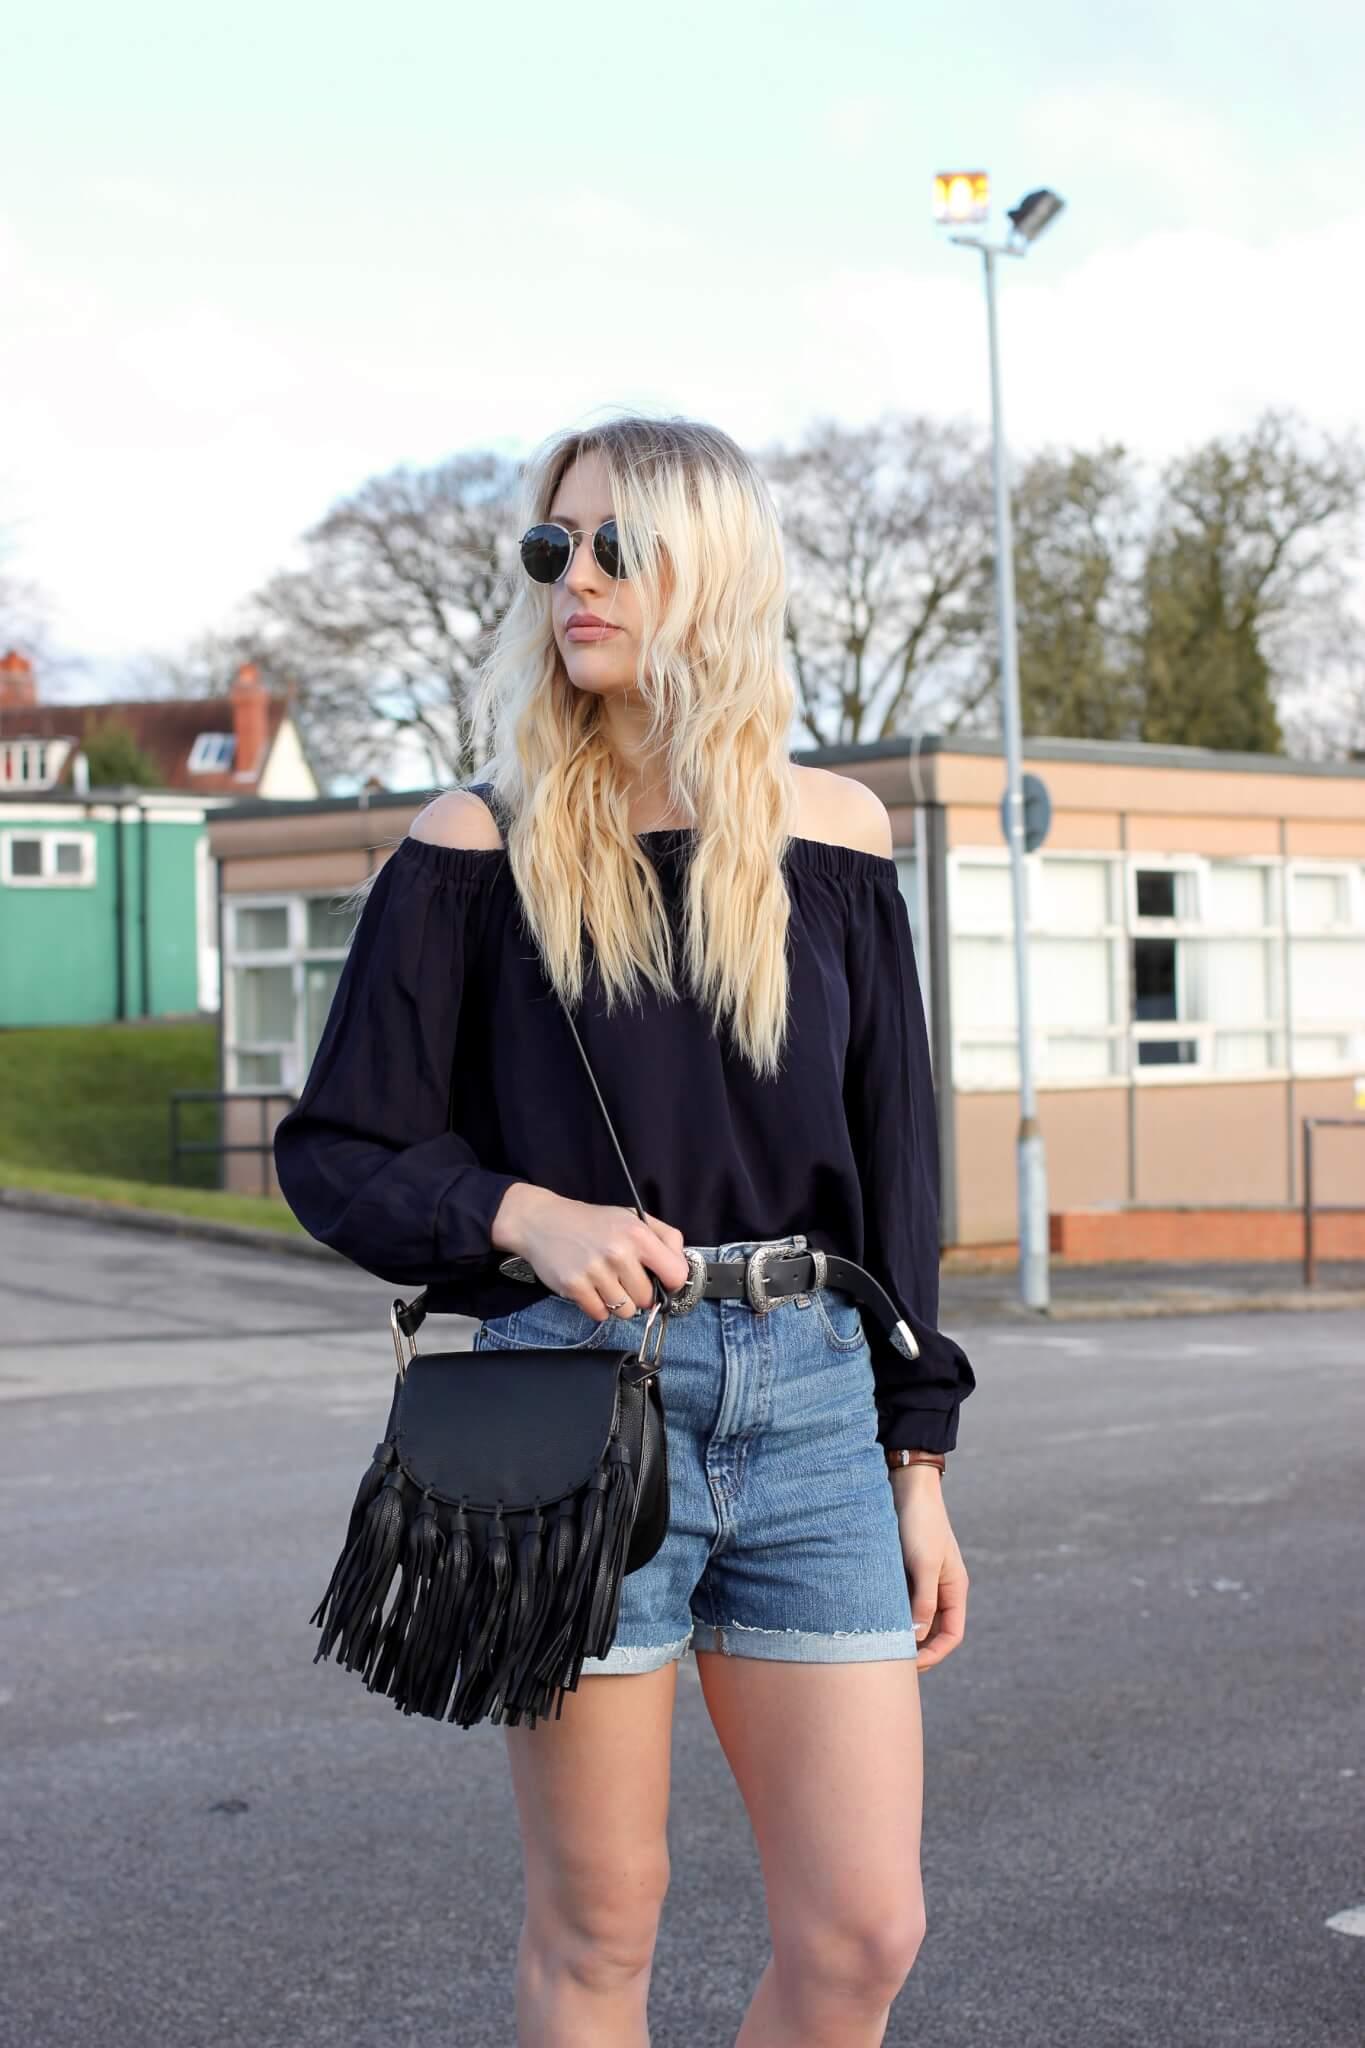 styling denim shorts for spring